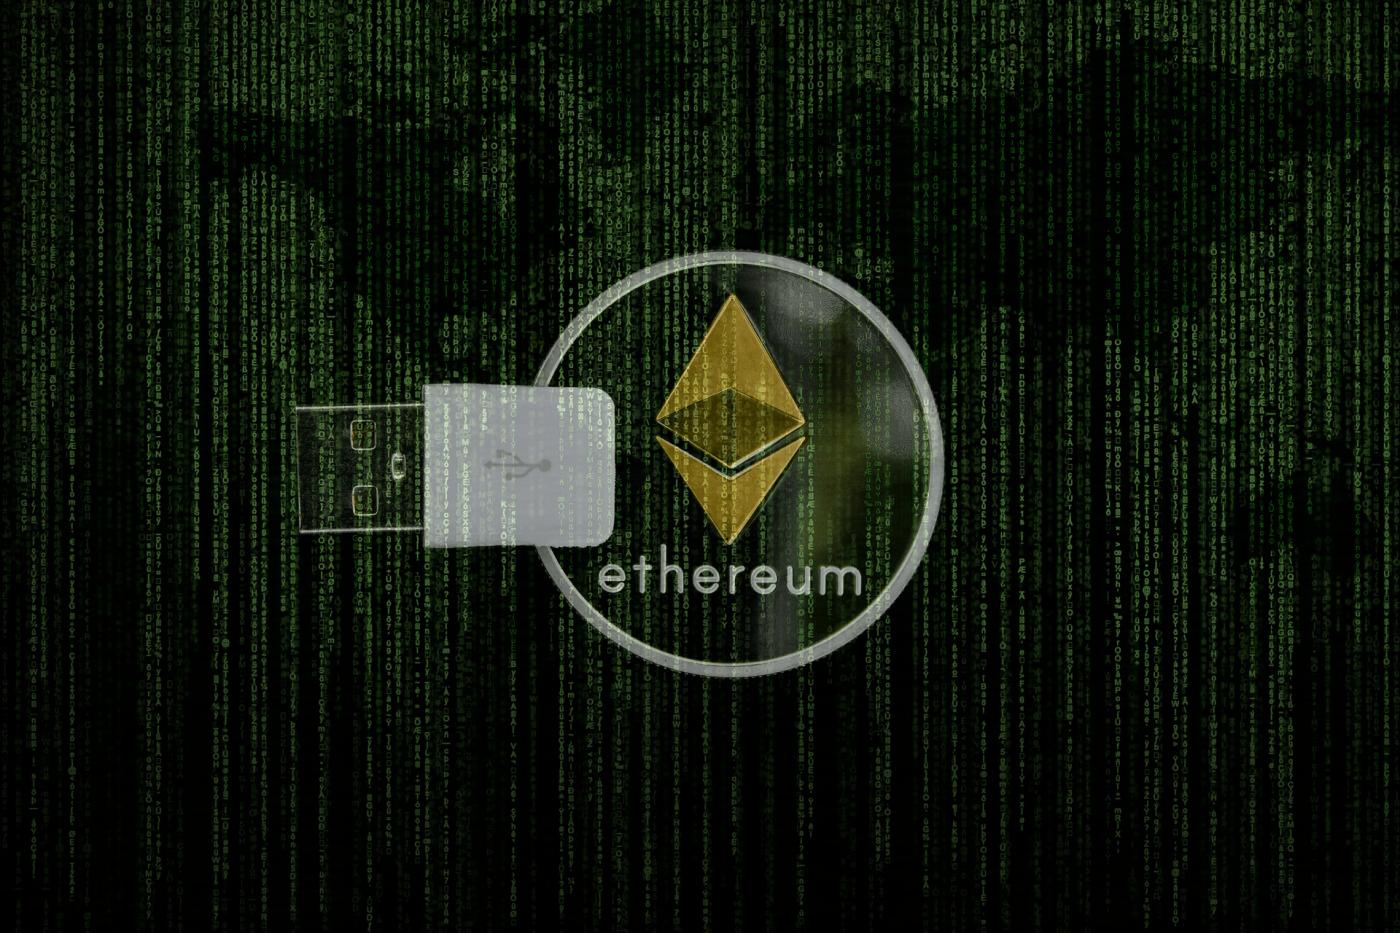 Ethereumが築く世界規模の巨大な組織 ~Enterprise Ethereum Alliance (イーサリアム企業連合)~